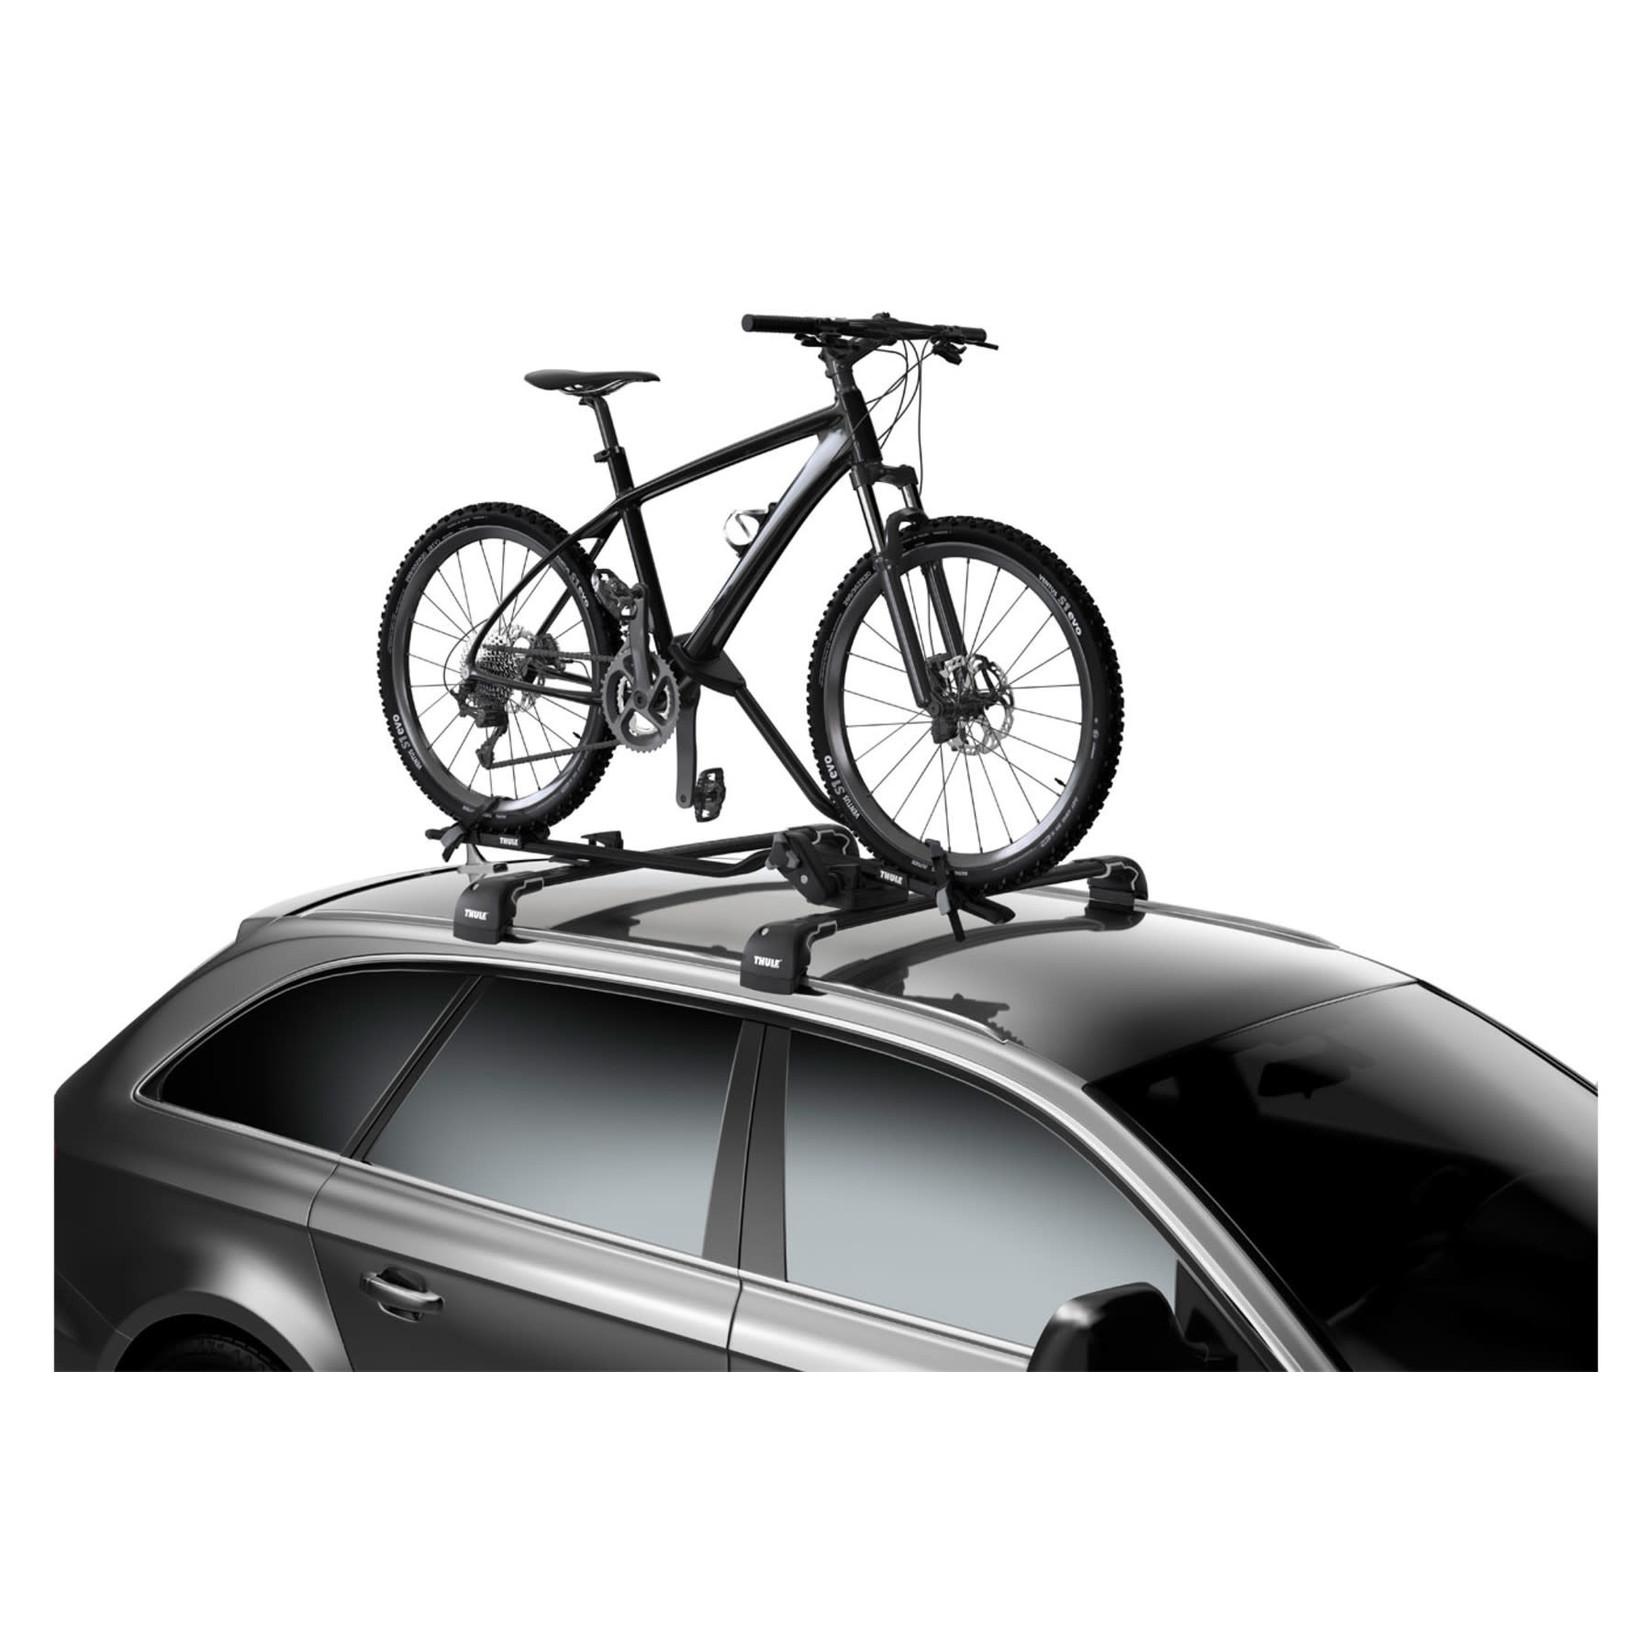 Thule Thule ProRide XT Bike Rack